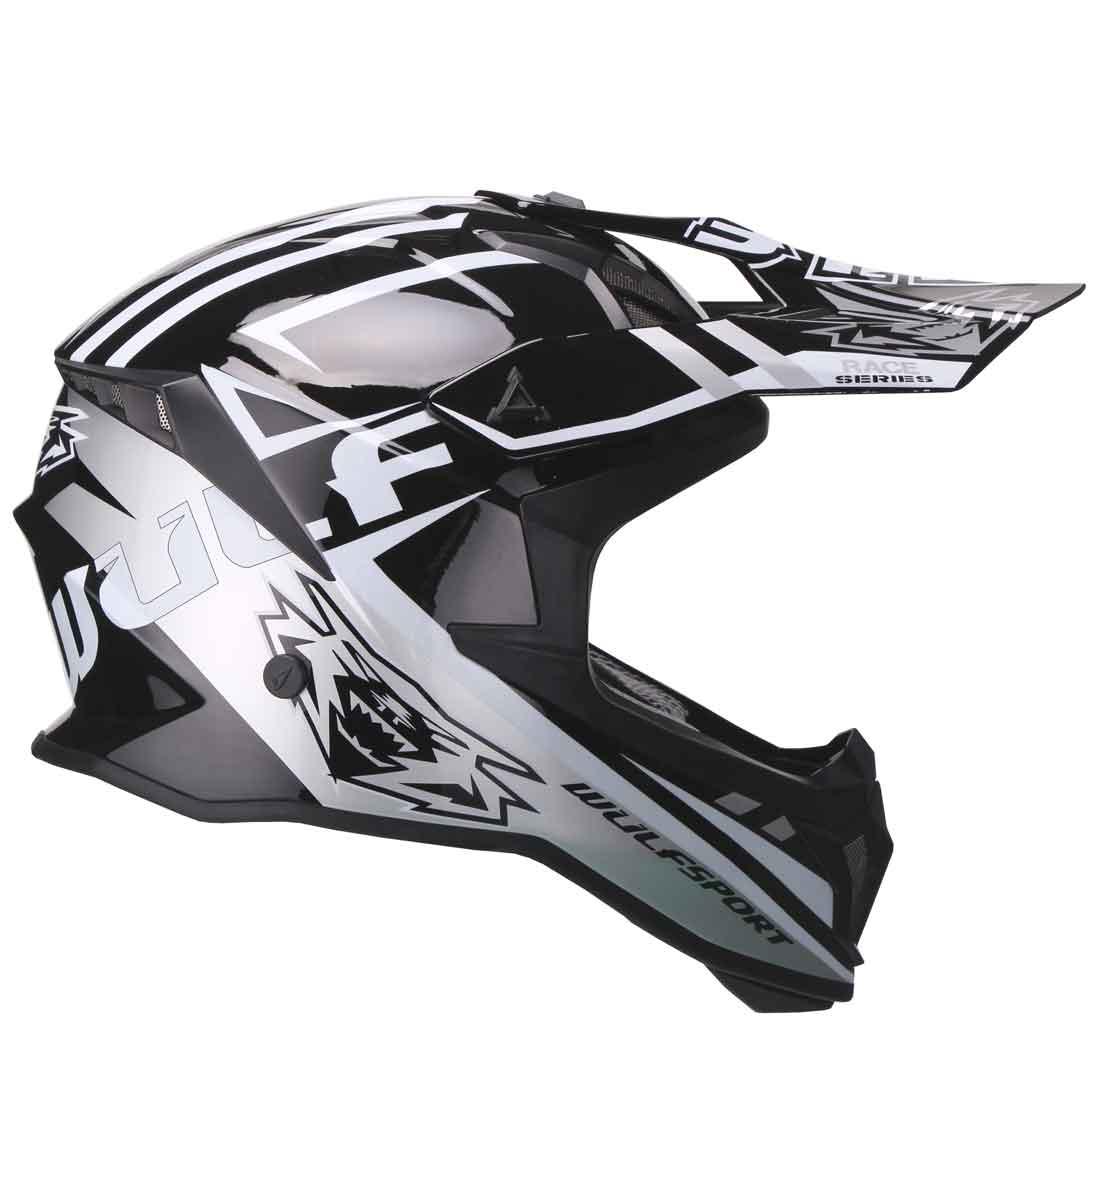 Wulfsport Race Series Helmet | Black | Large (59-60cm)